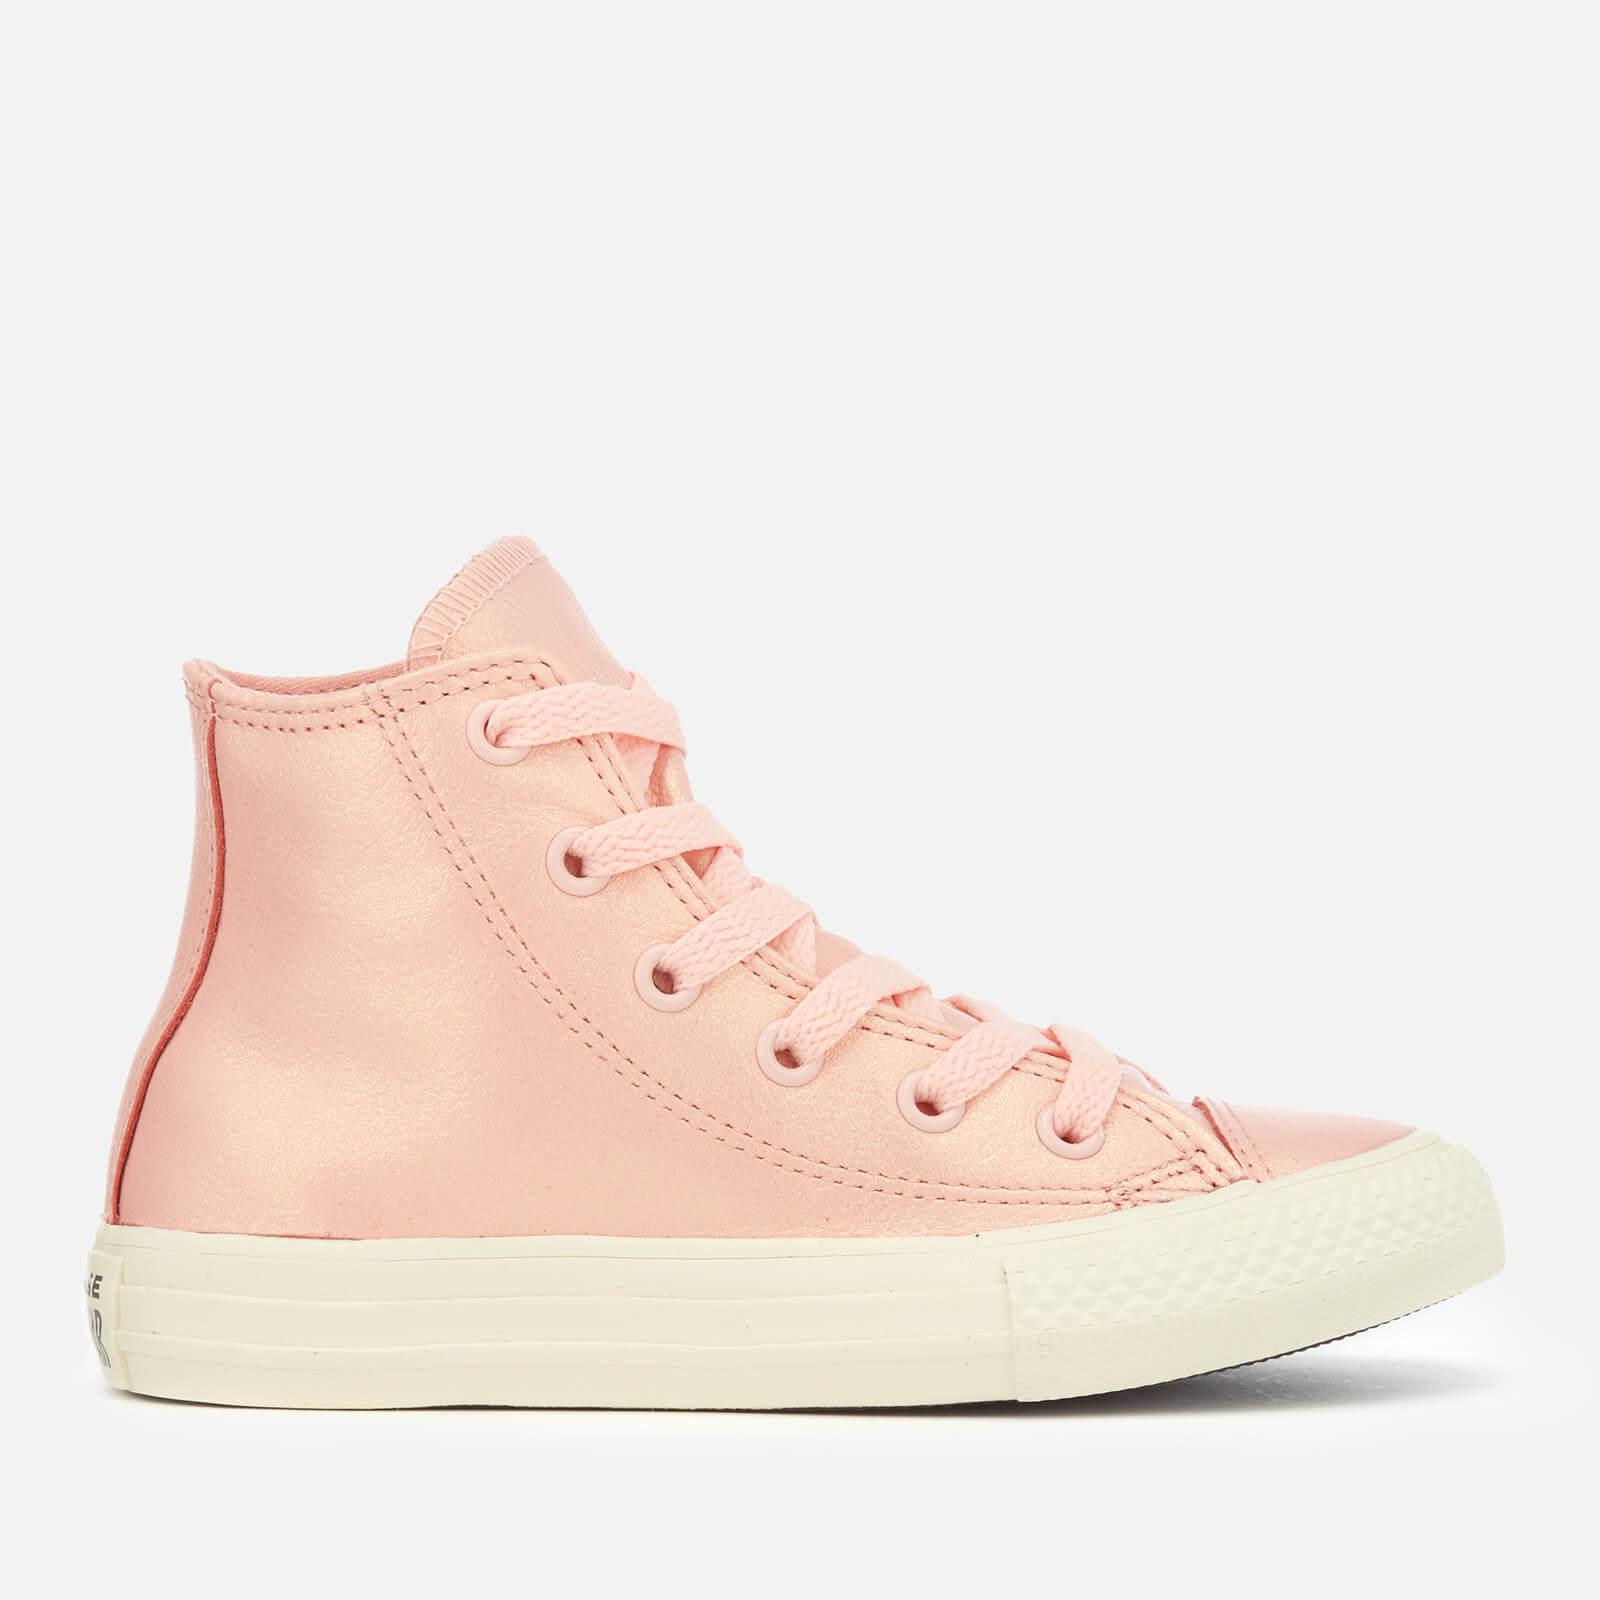 298e3d5400d7 Converse Kids  Chuck Taylor All Star Hi-Top Trainers - Storm Pink Metallic  Gunmetal Junior Clothing